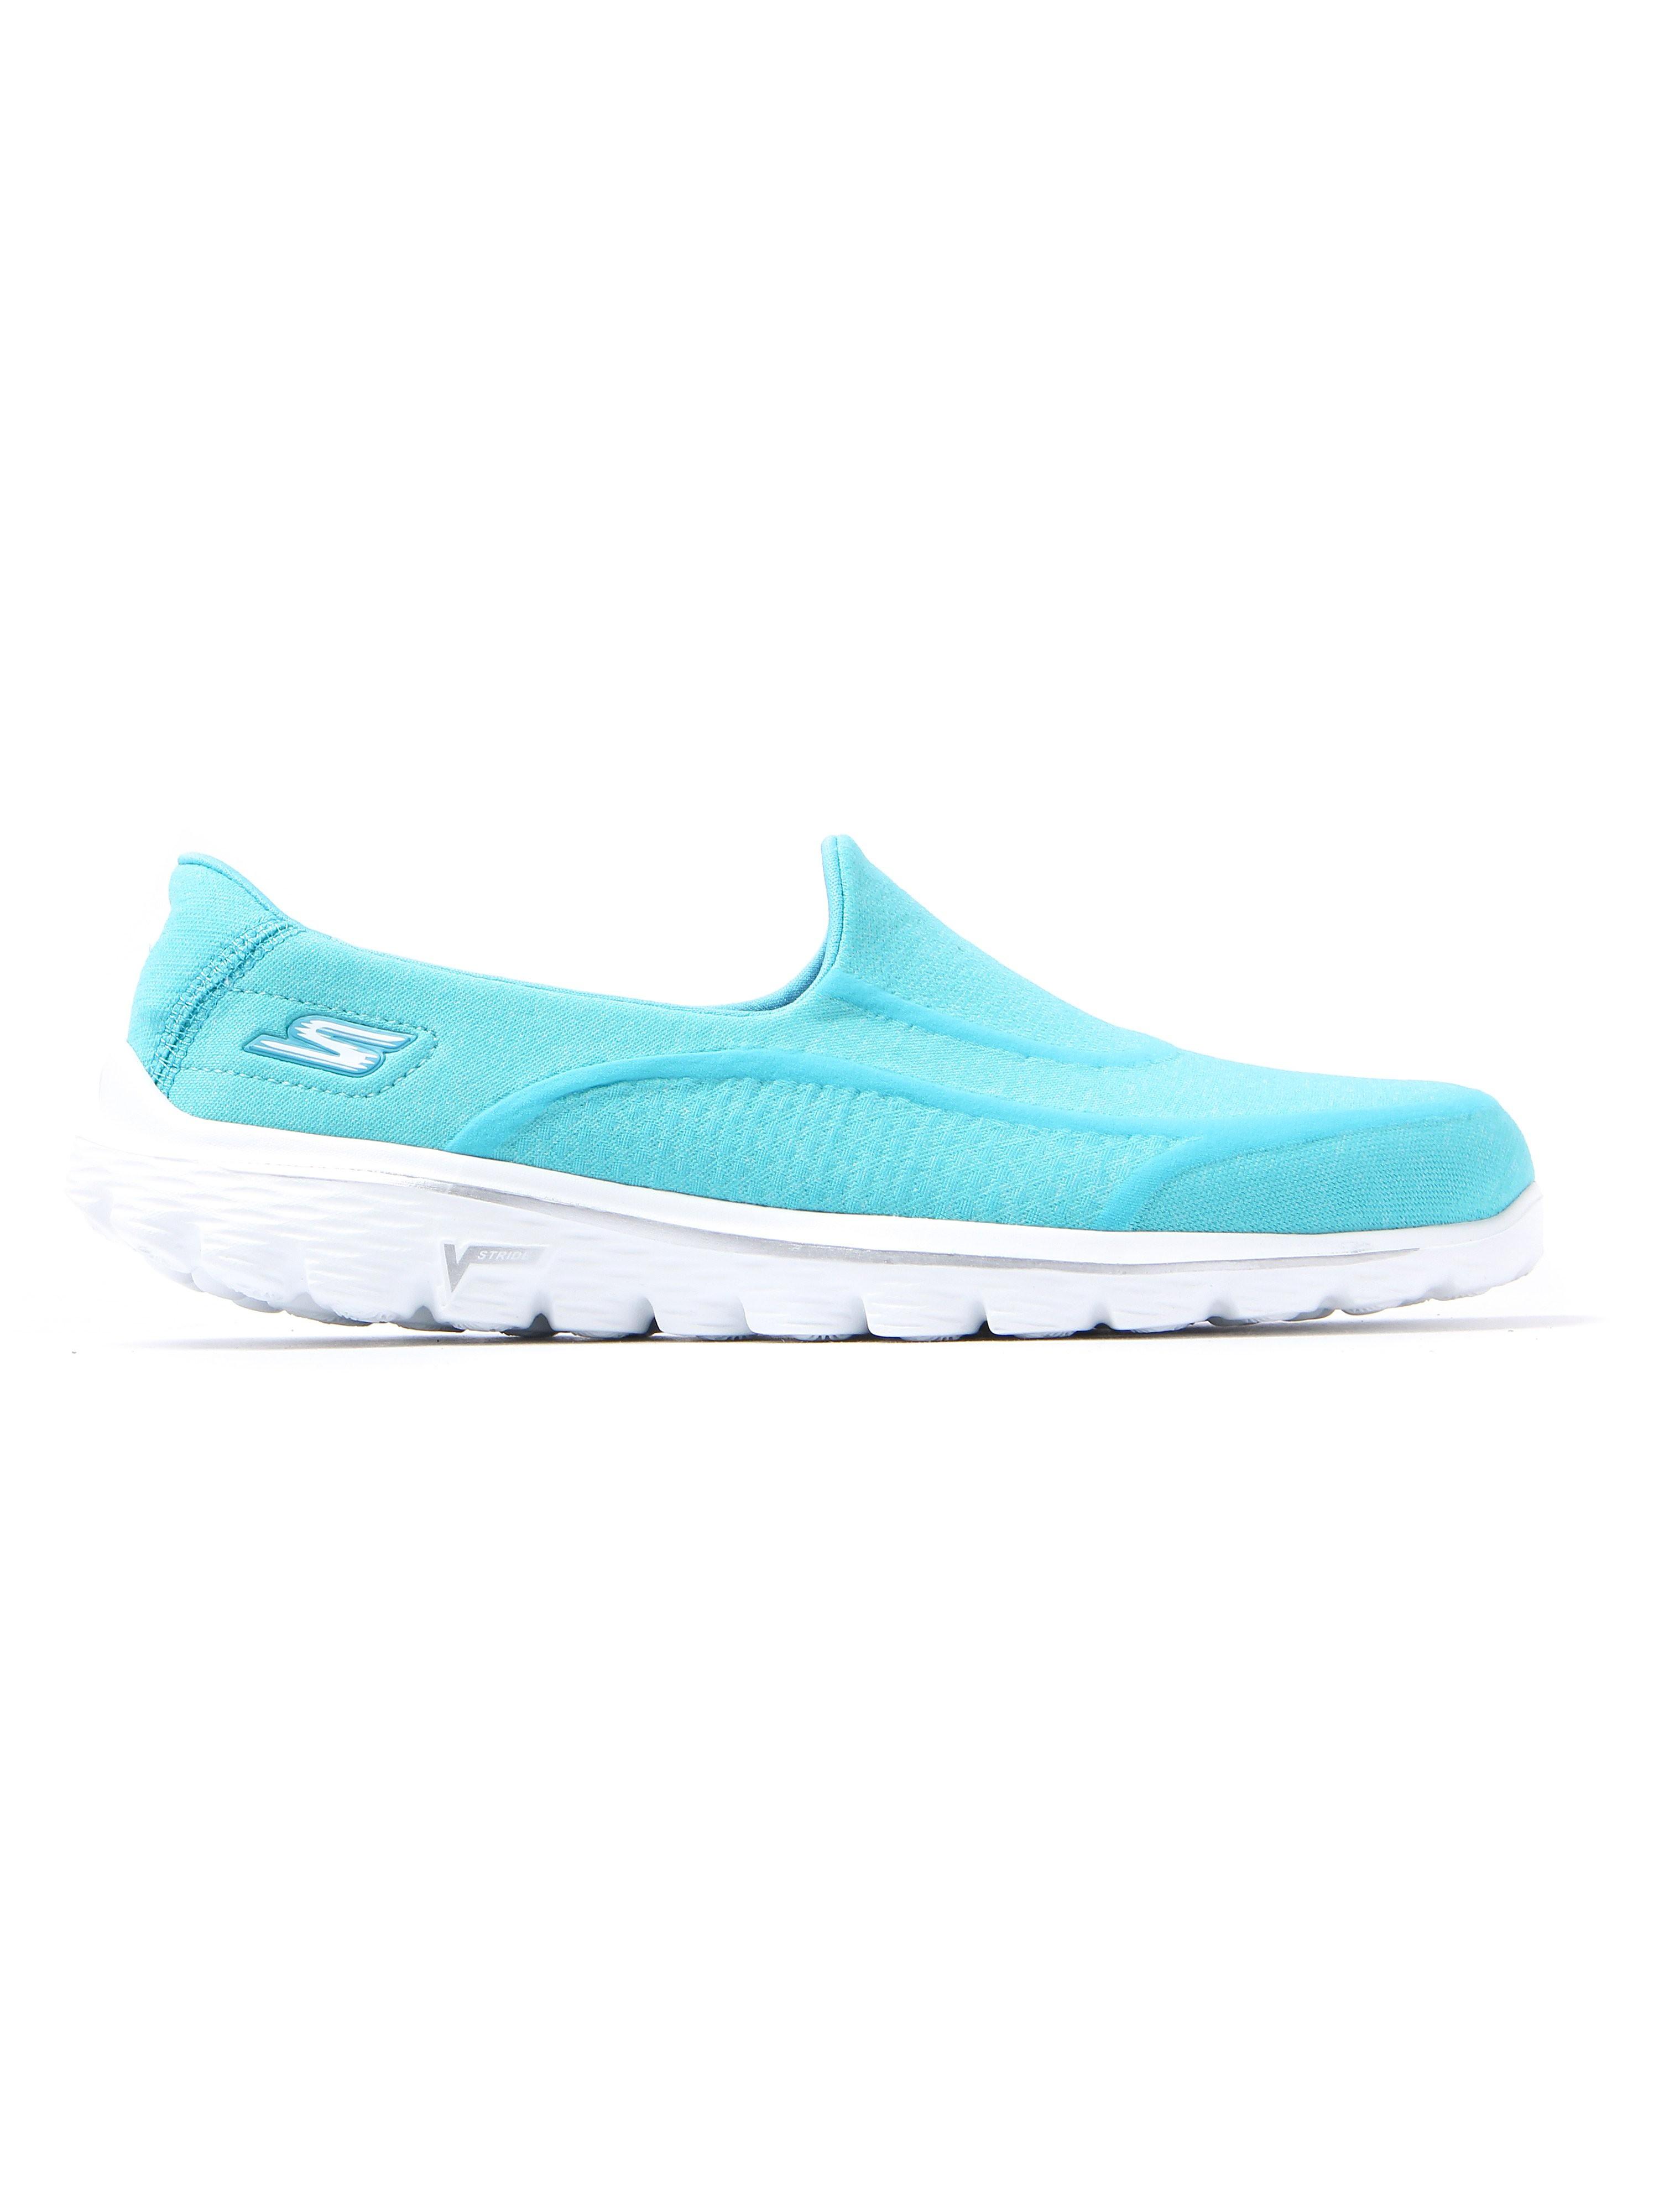 Skechers Women's GO Walk 2 Super Sock Slip On Trainers - Aqua